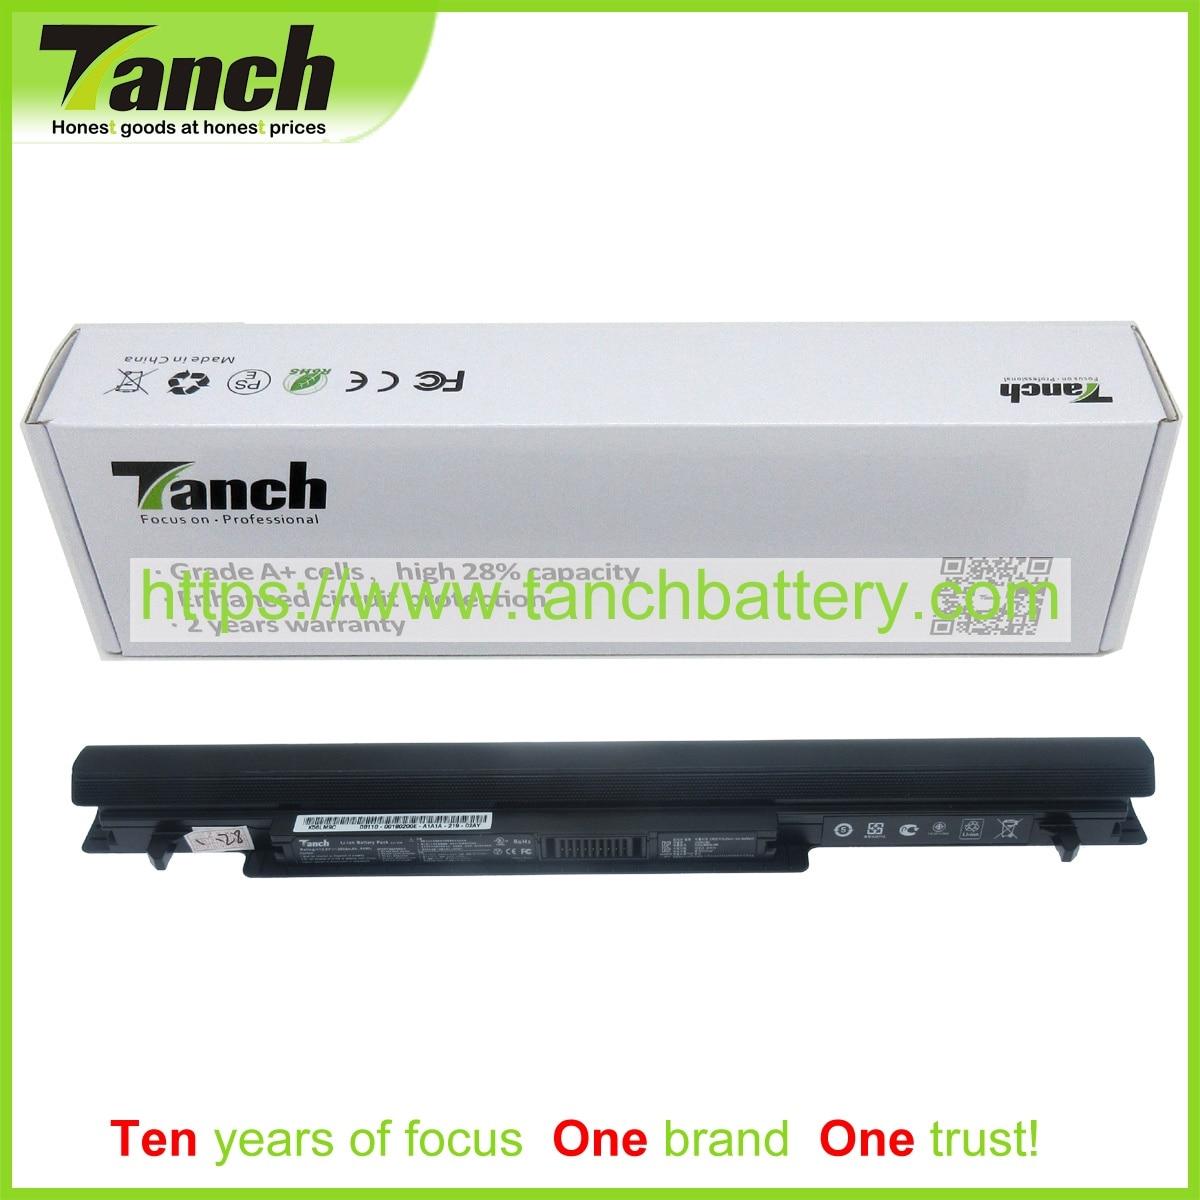 Tanch بطارية كمبيوتر محمول ل ASUS A31-K56 A41-K56 K56CA K56CM A46C R505 K46CM S550CM 15V 4 الخليوي